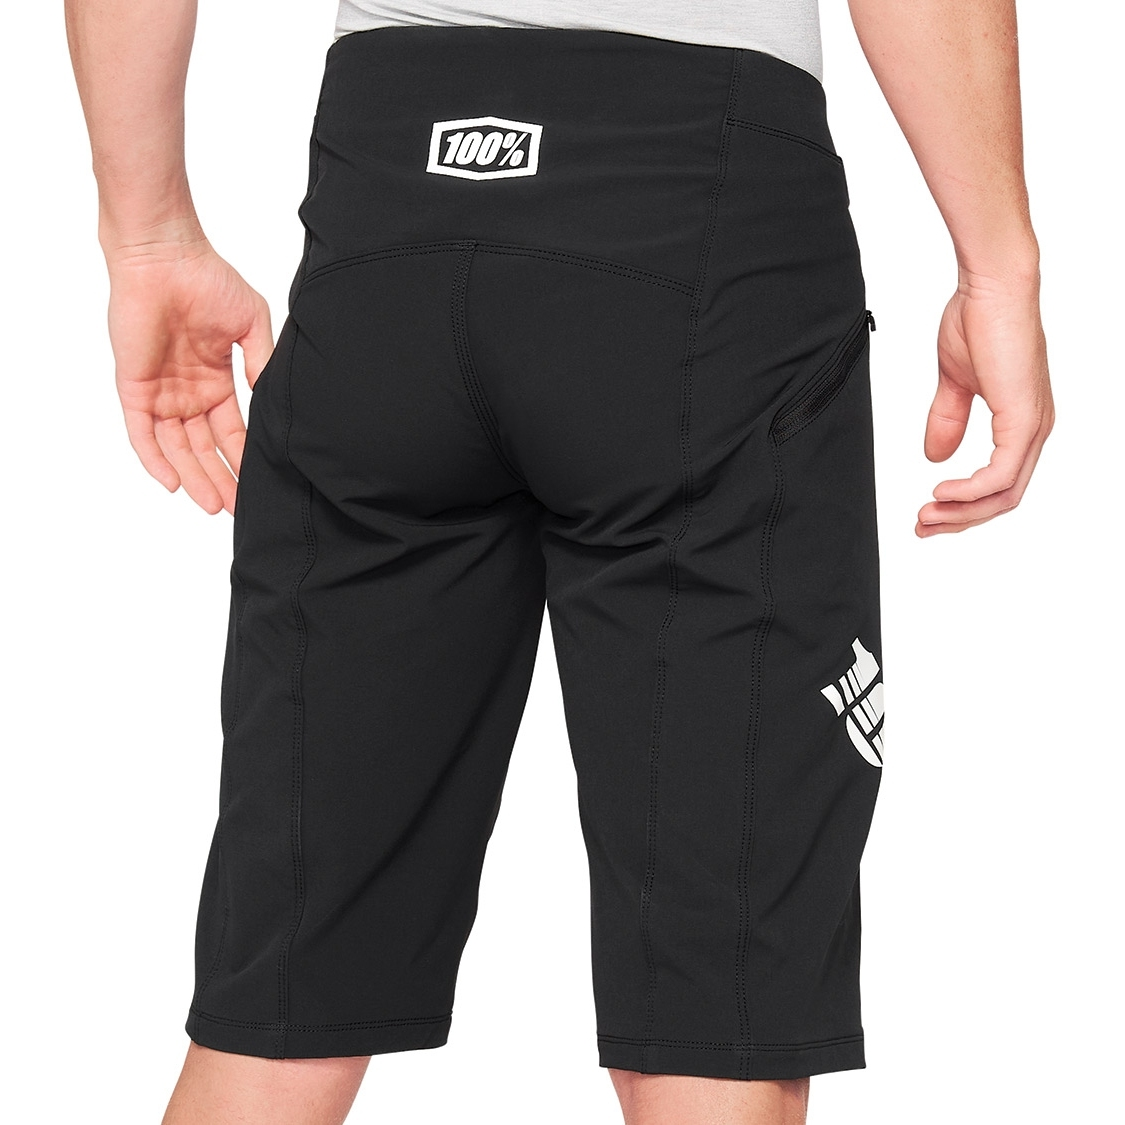 Imagen de 100% R-Core-X Pantalones - negro